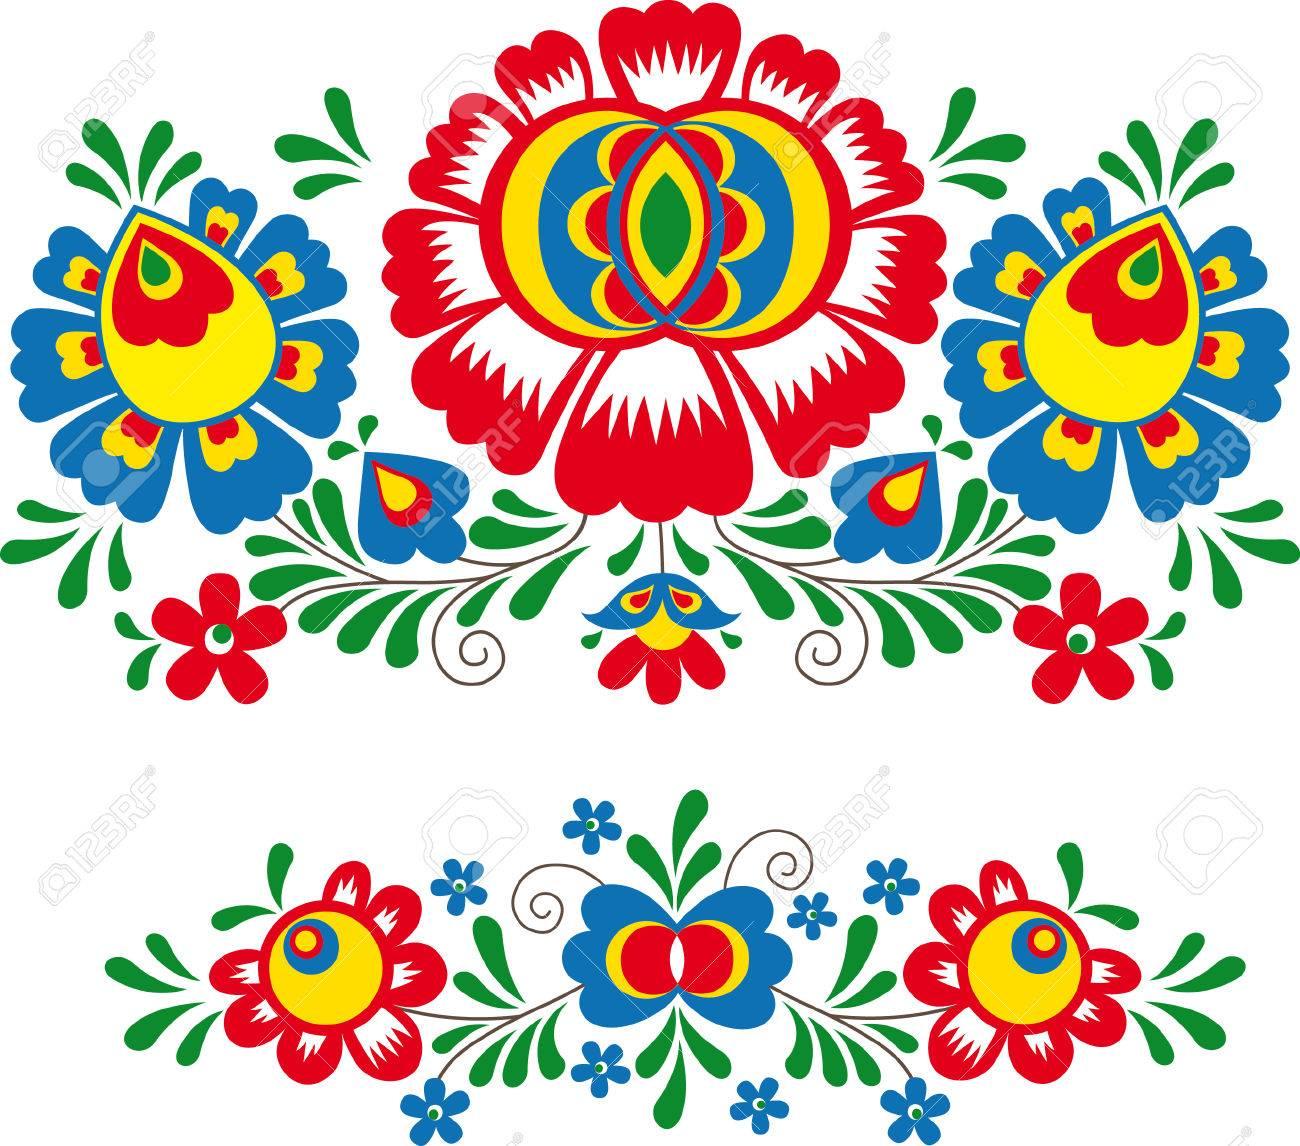 Folk ornaments - 63801375